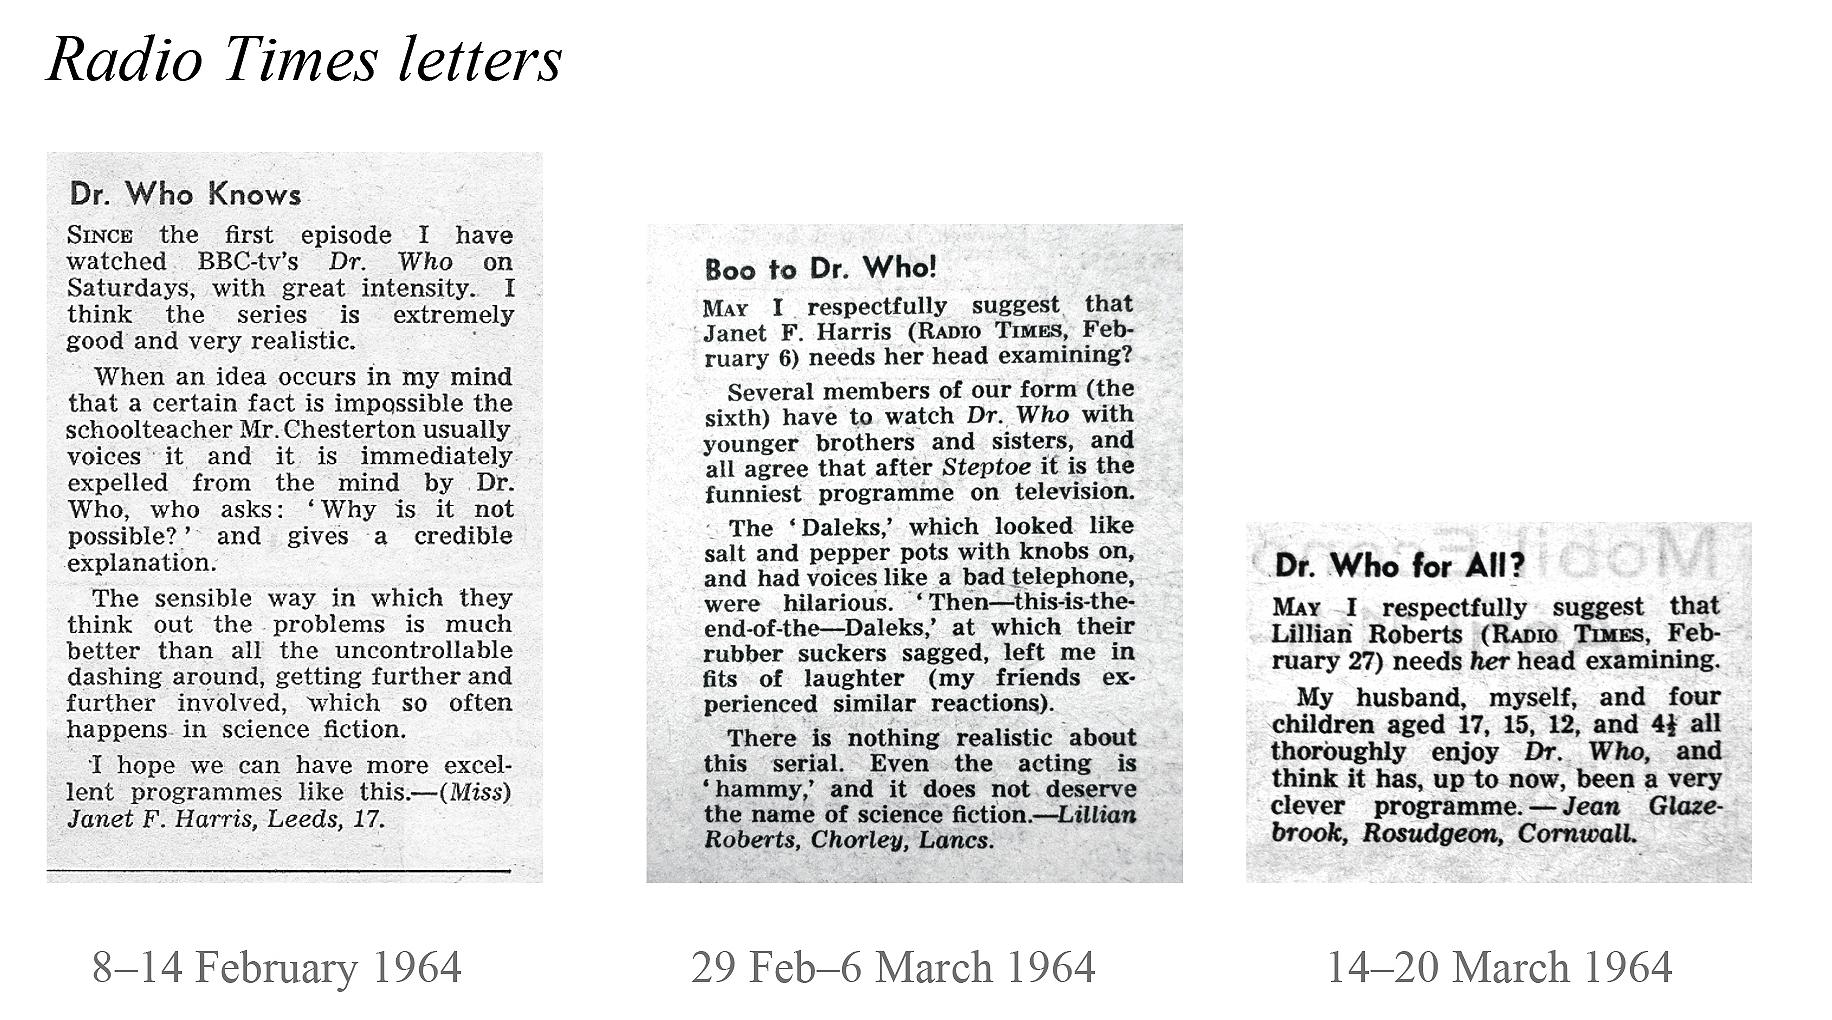 Microsoft Word - Radio Times letters.doc